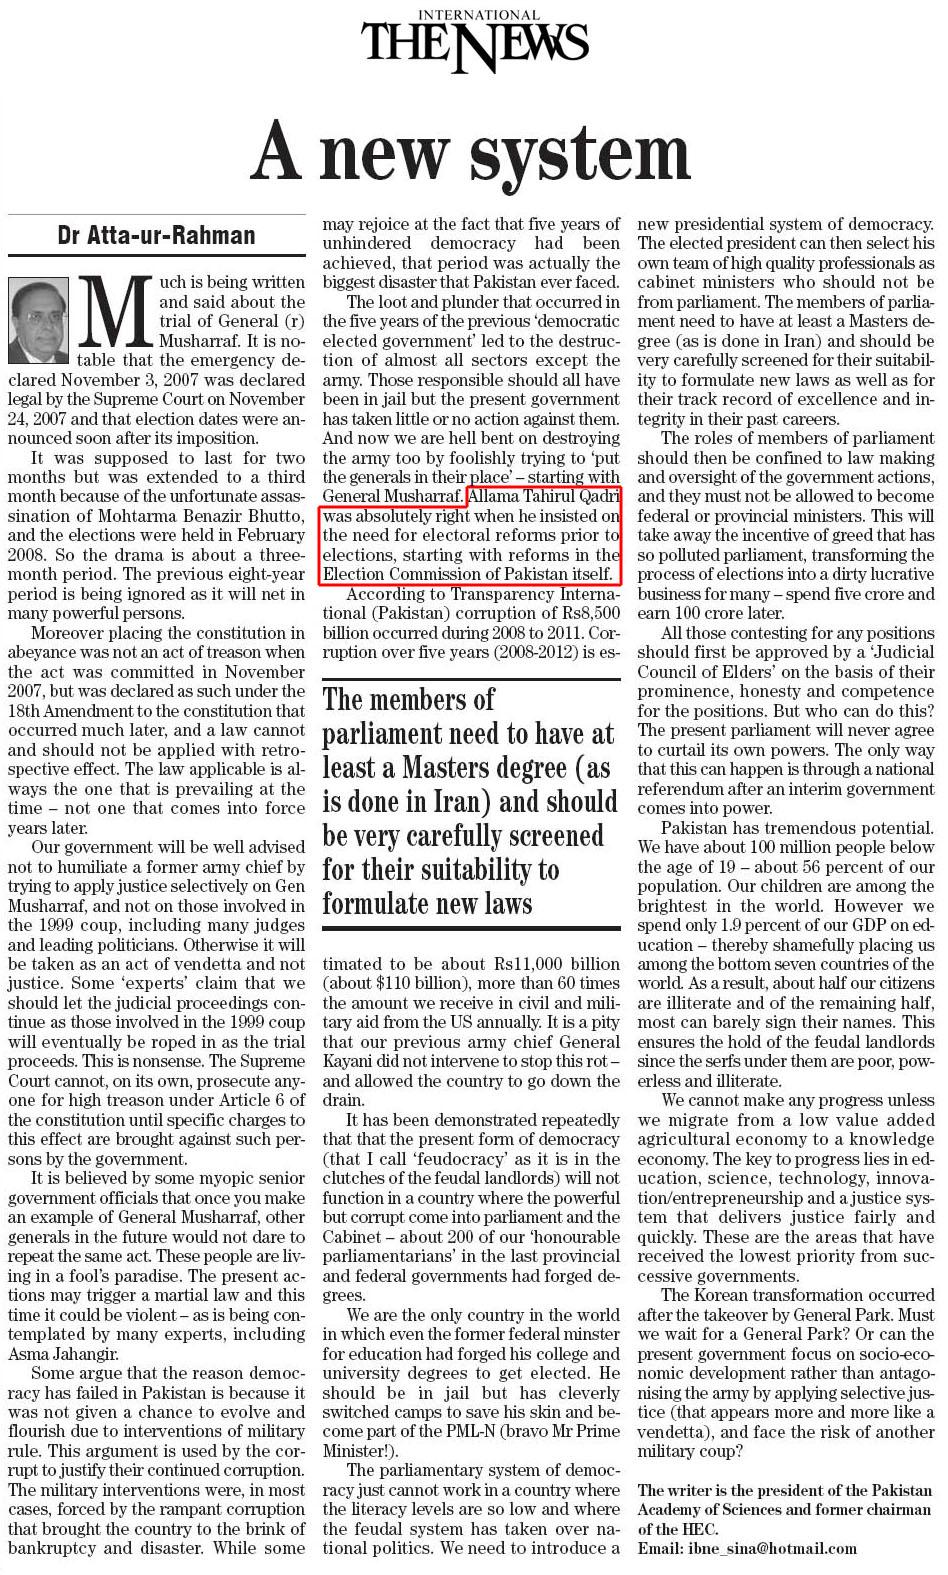 Mustafavi Student Movement Print Media Coverage Daily The News - Dr Atta ur Rahman